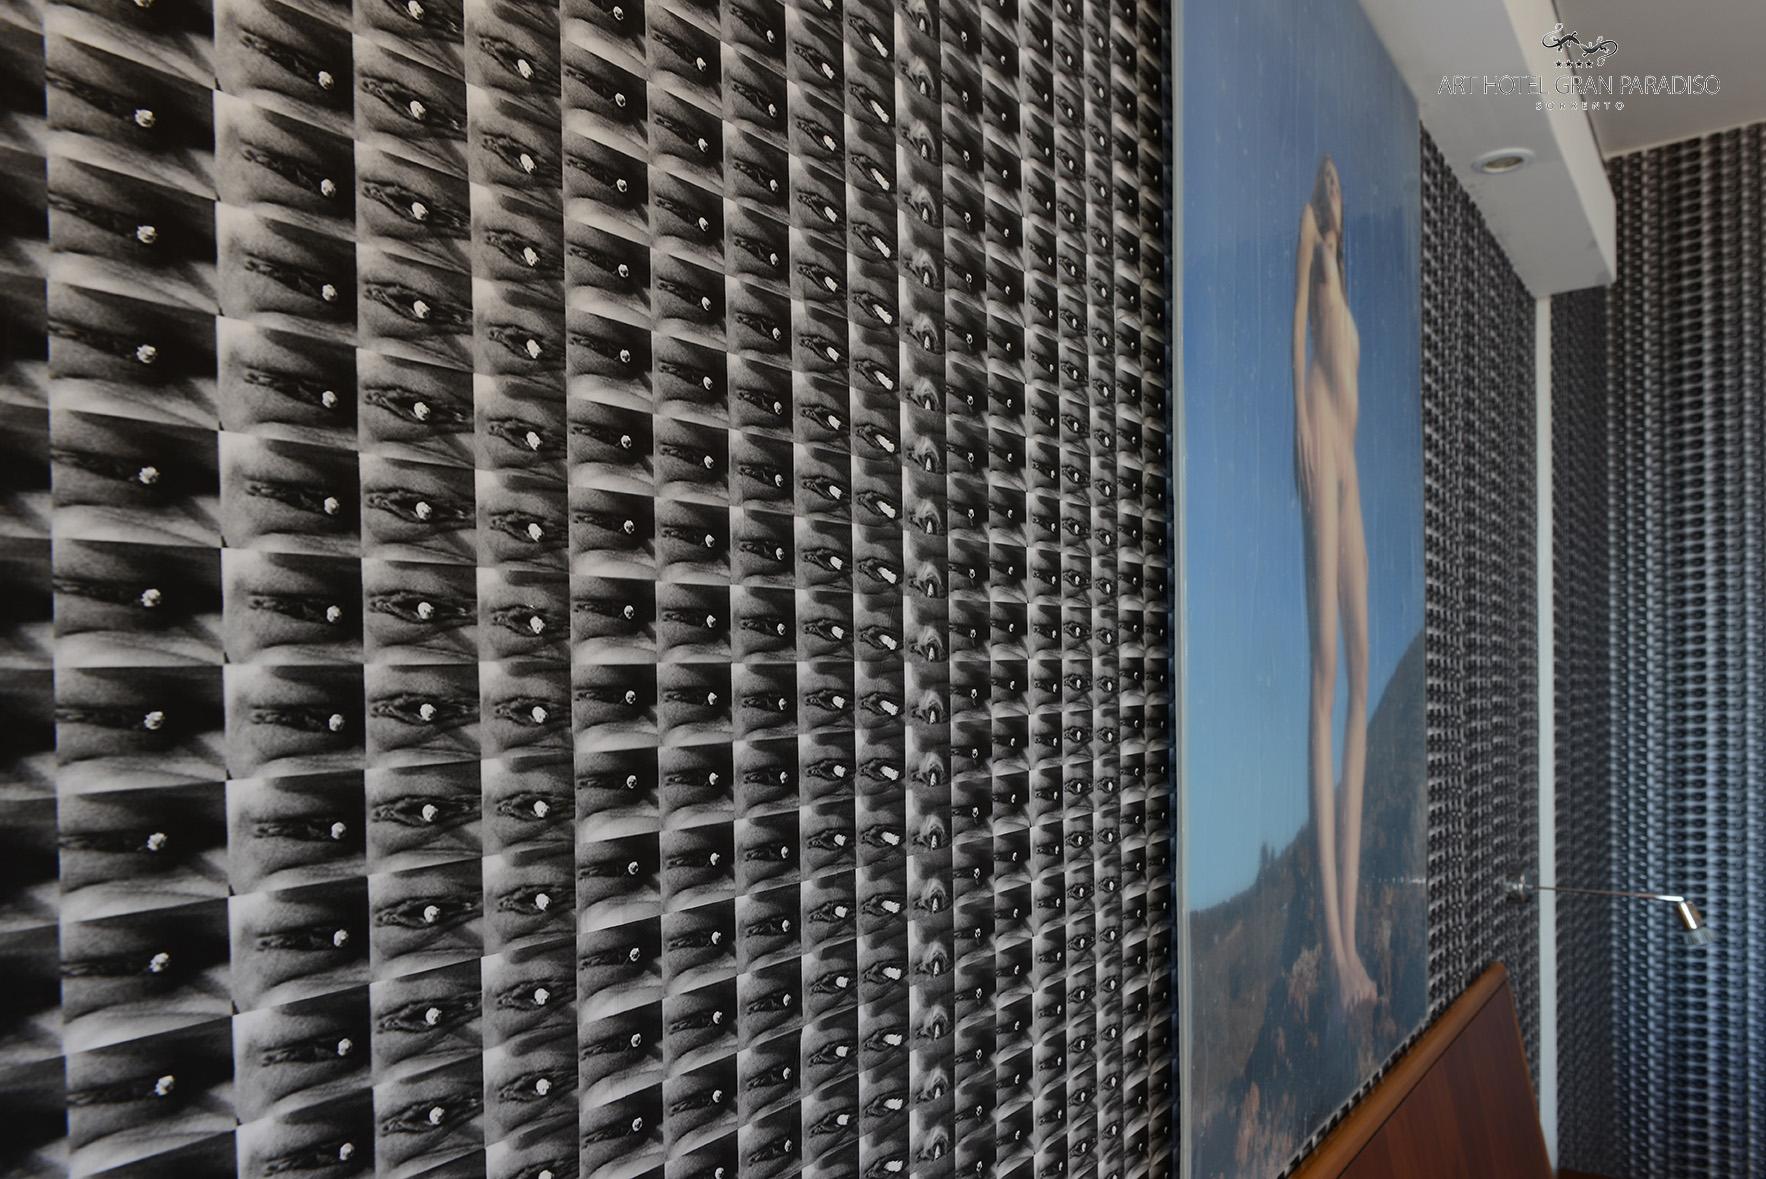 Art_Hotel_Gran_Paradiso_2013_101_Moio&Sivelli_6.jpg